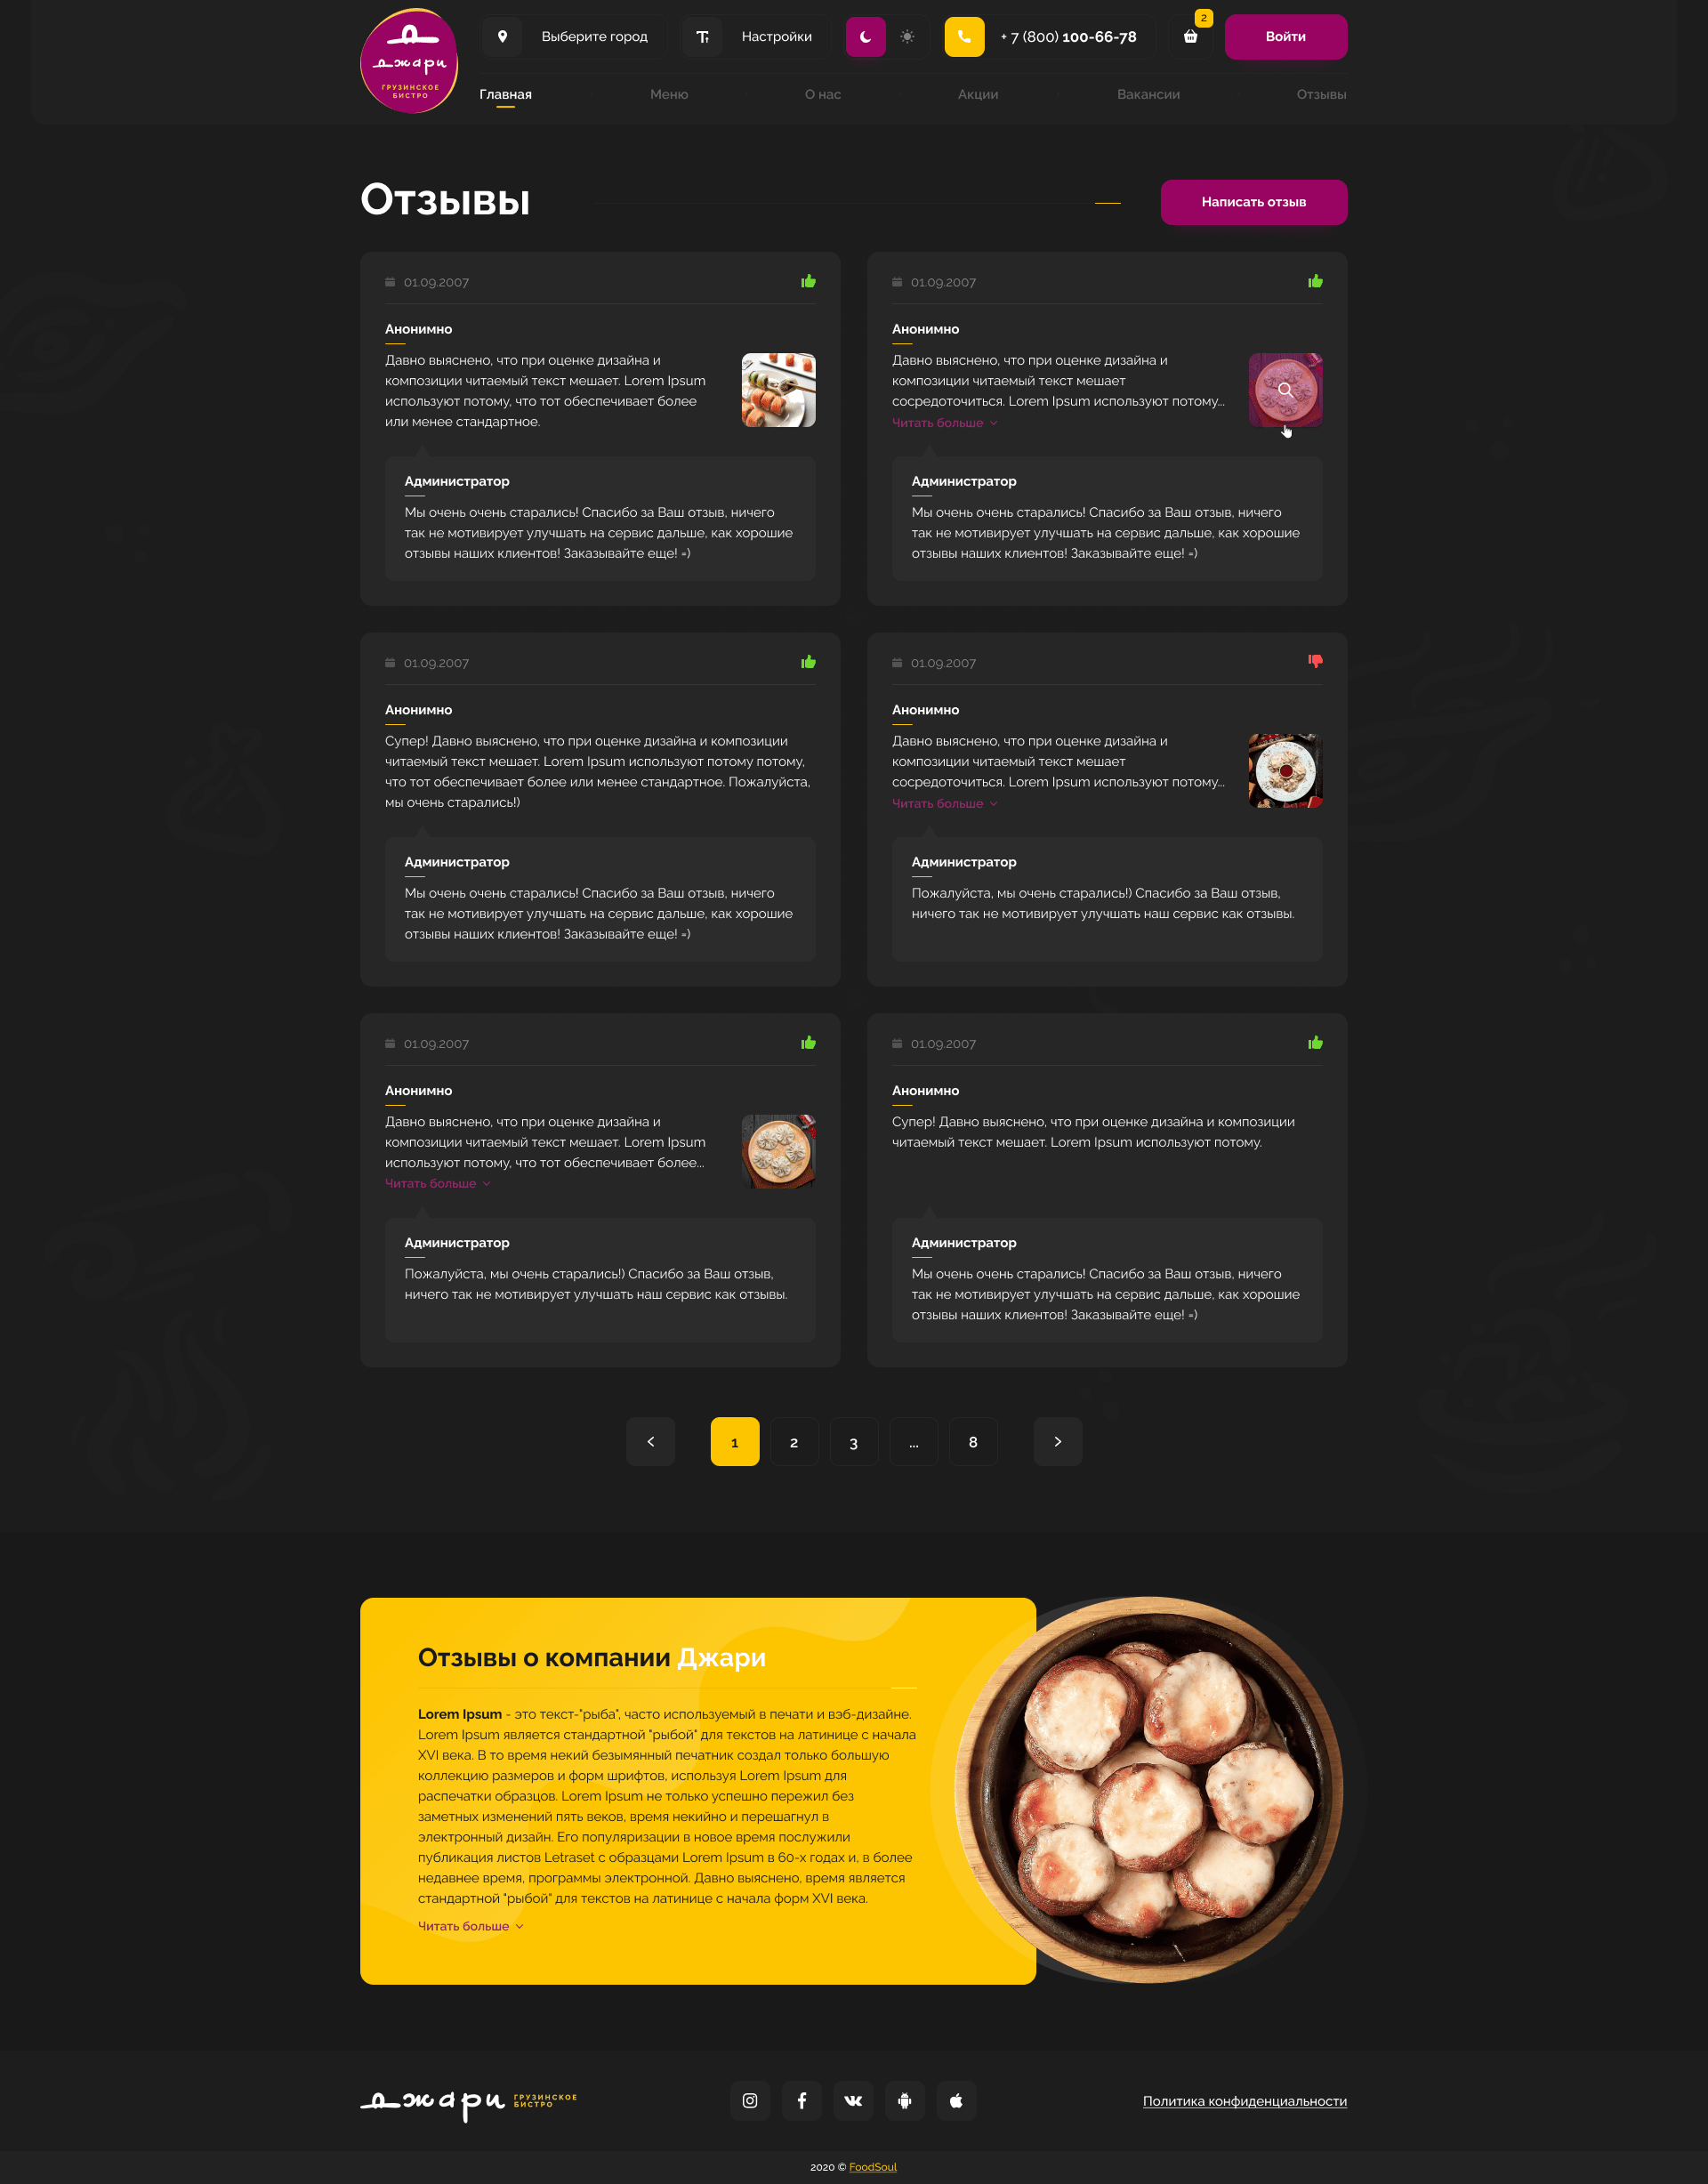 FoodSoul_04_Feedback_Page_1.0 (1)